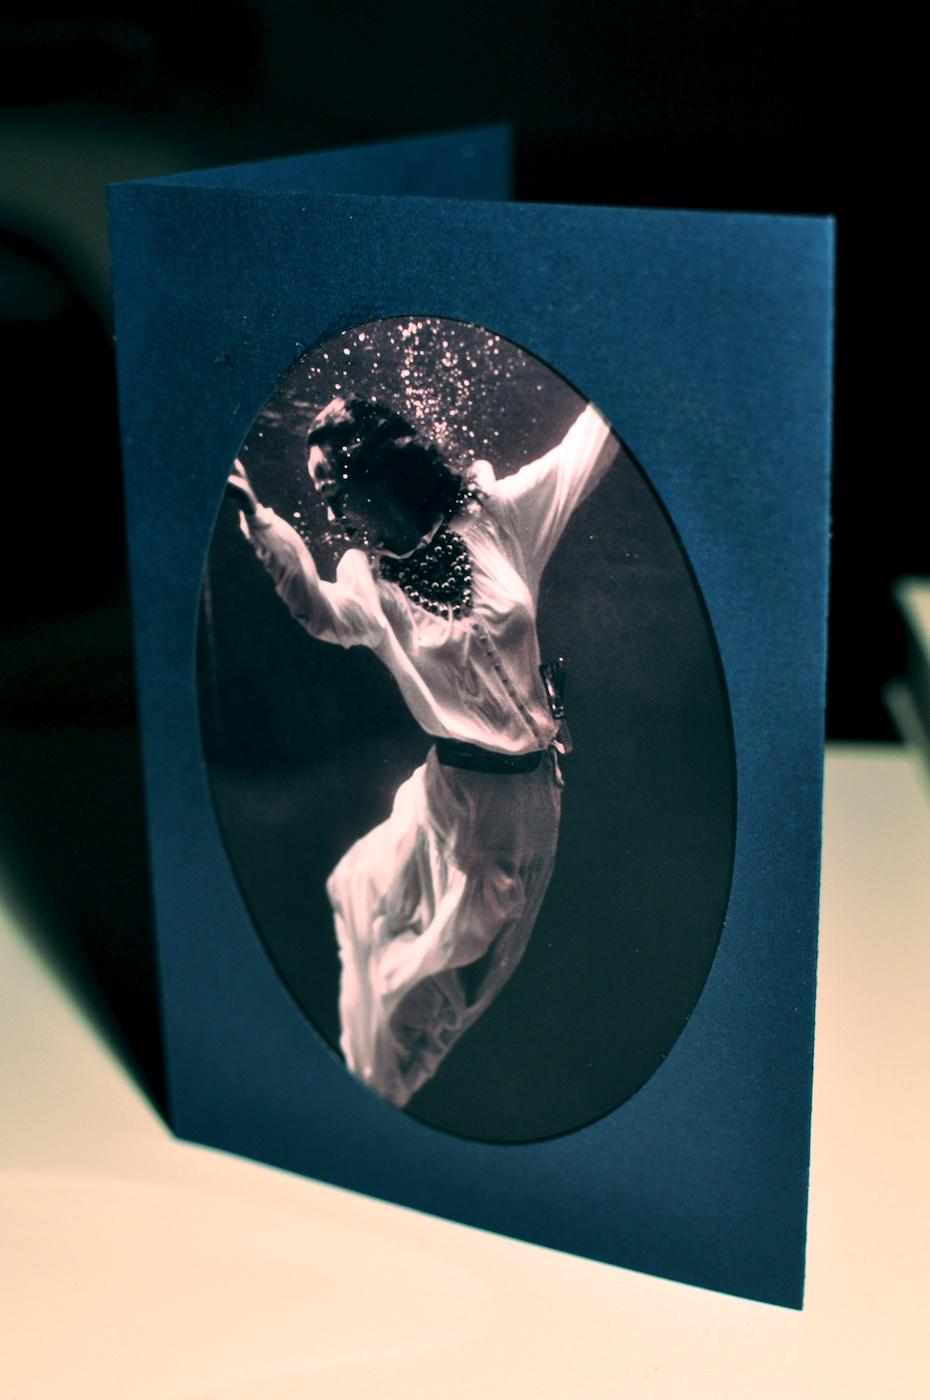 Be Creative #111 - DIY greeting card, @ Ines Häufler, 2011